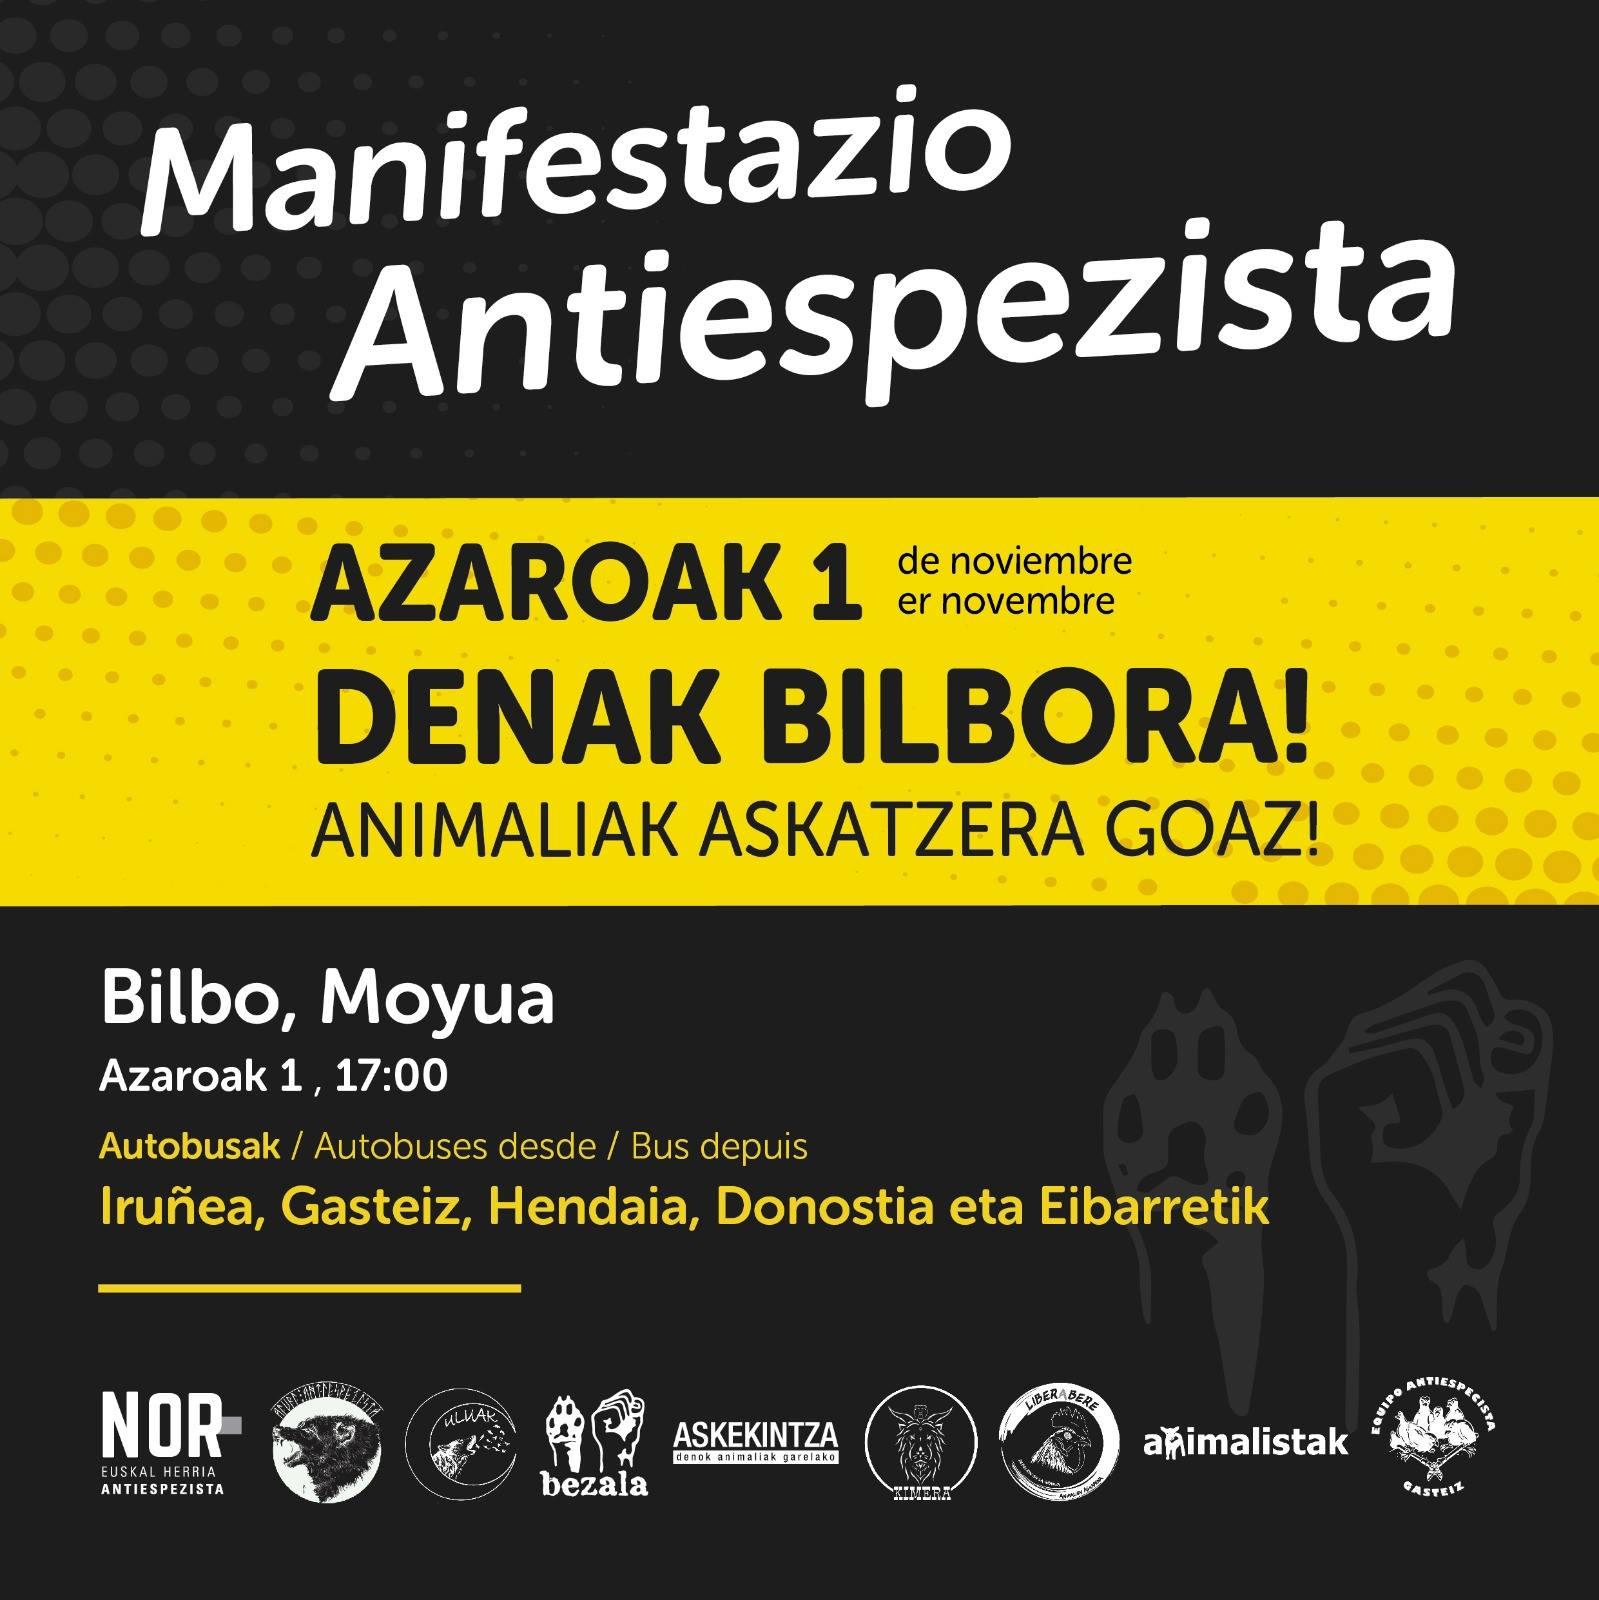 Manifestación Antiespecista 1 de noviembre Bilbao